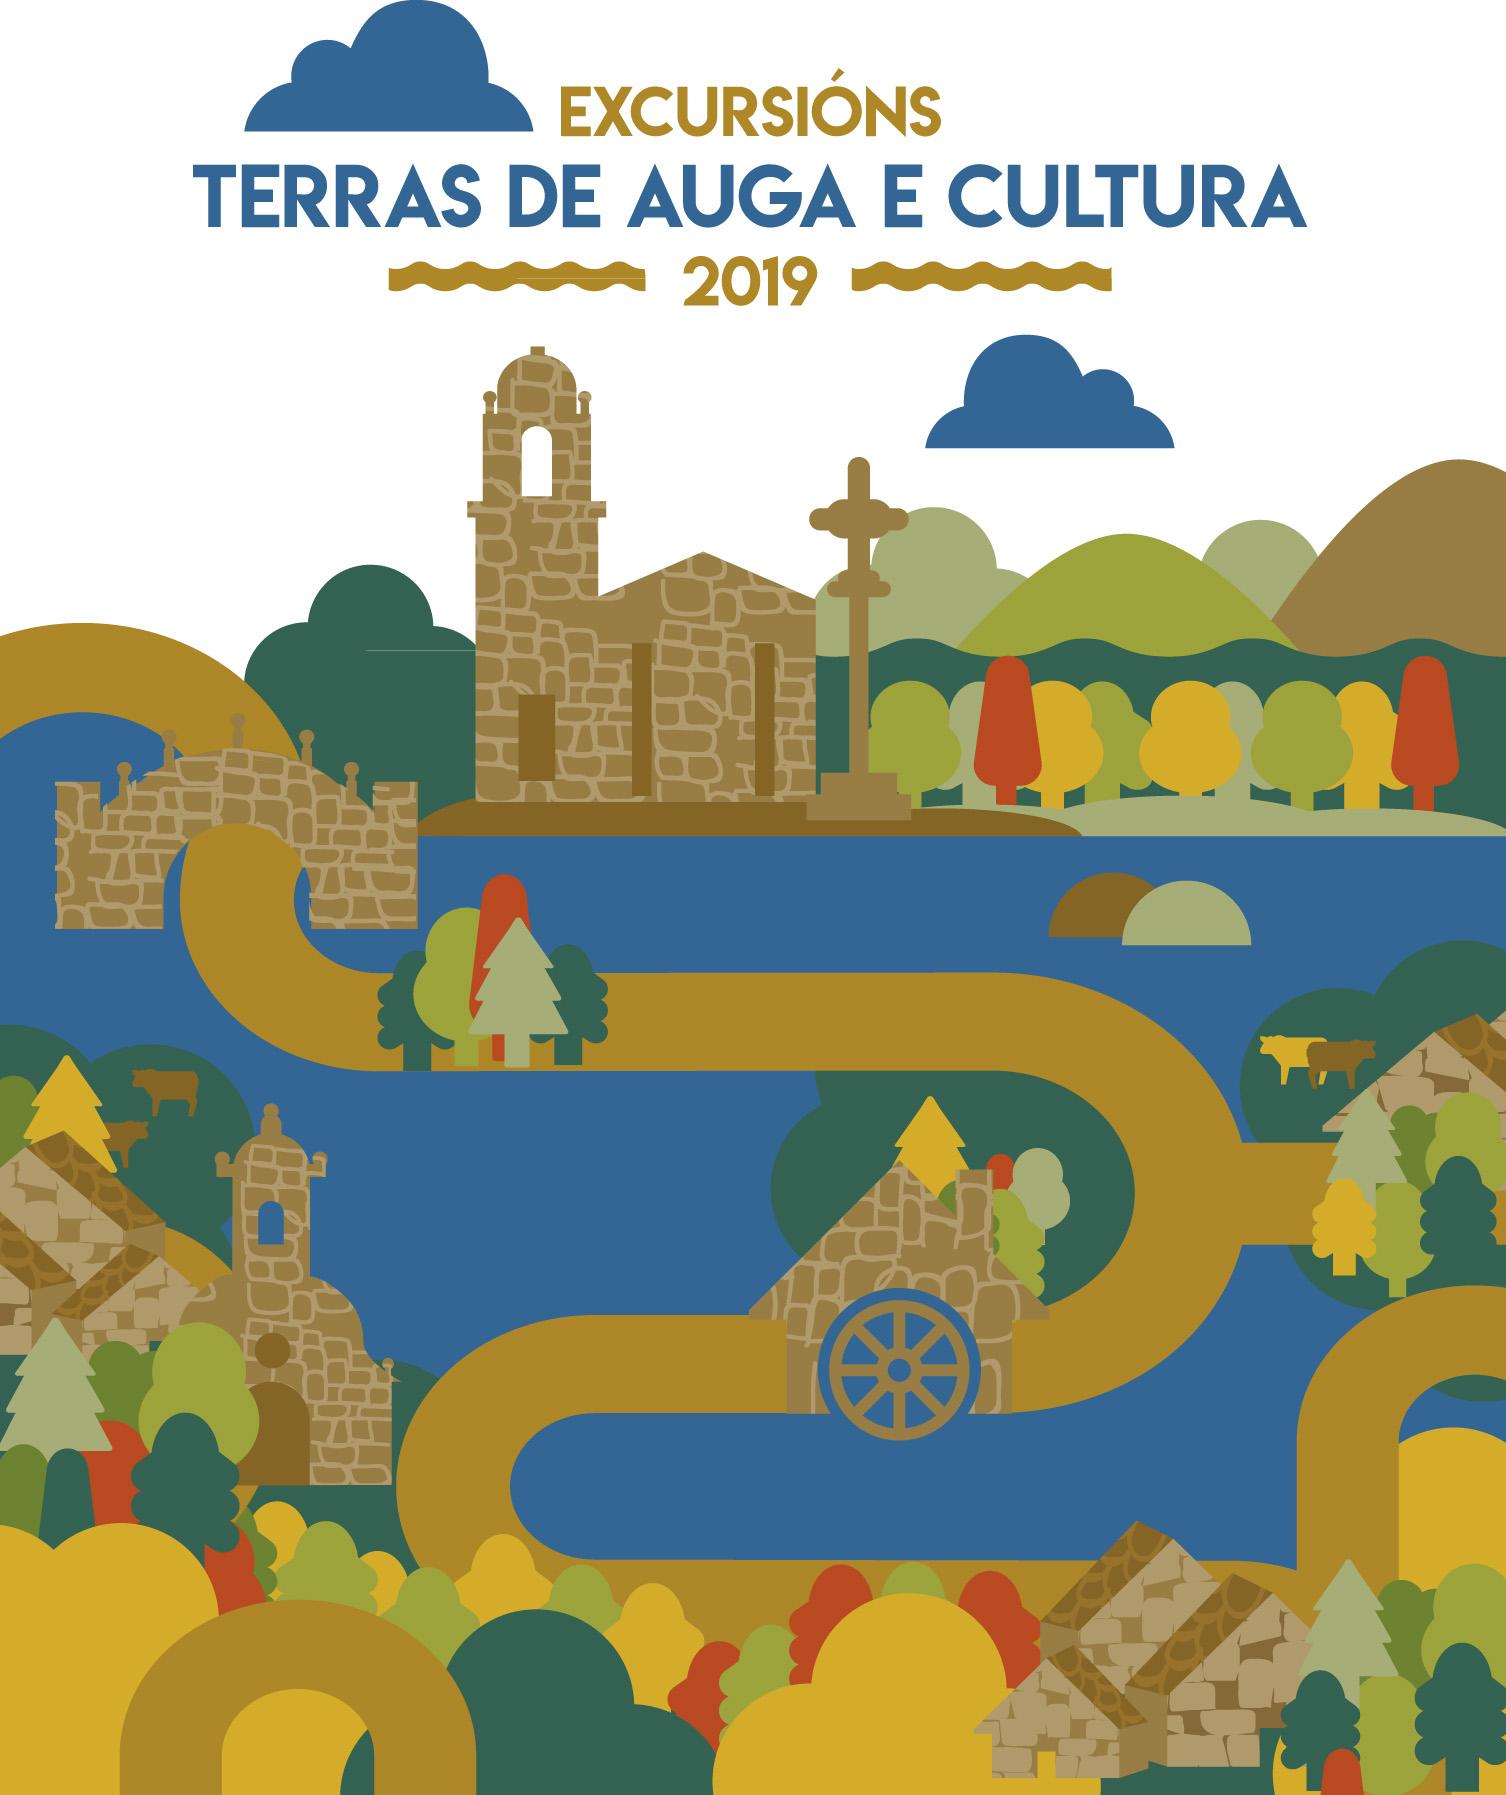 programacion-terra-auga-cultura-lugo